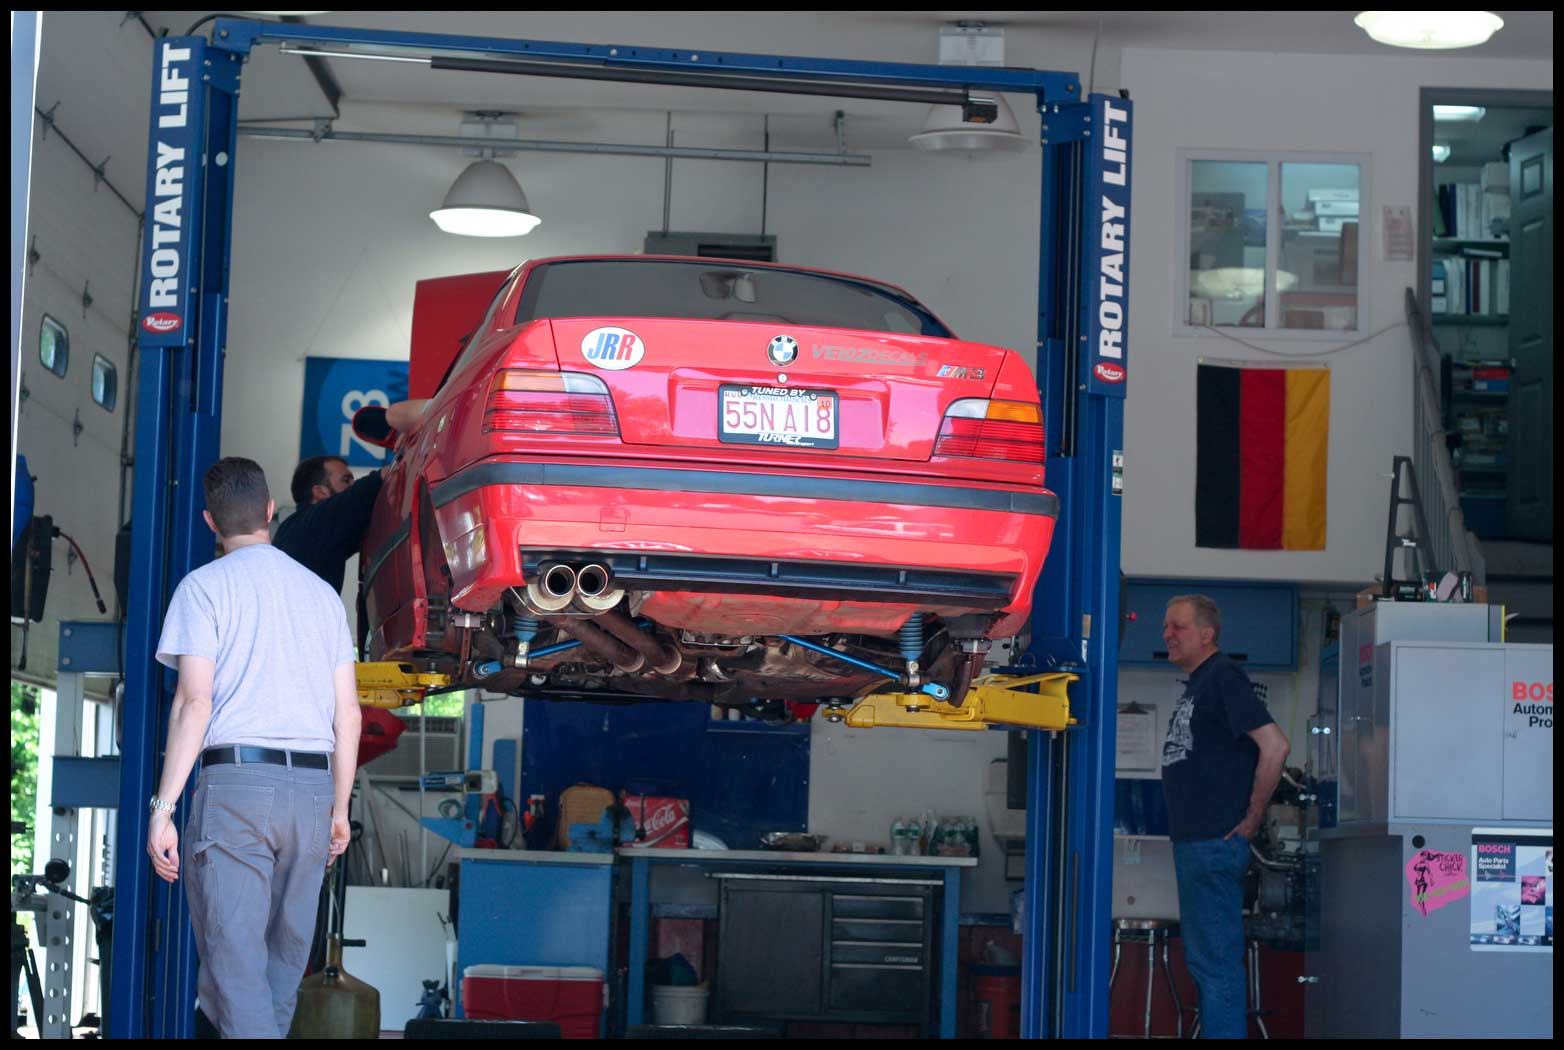 Schneller-BMW-e36-M3-Race